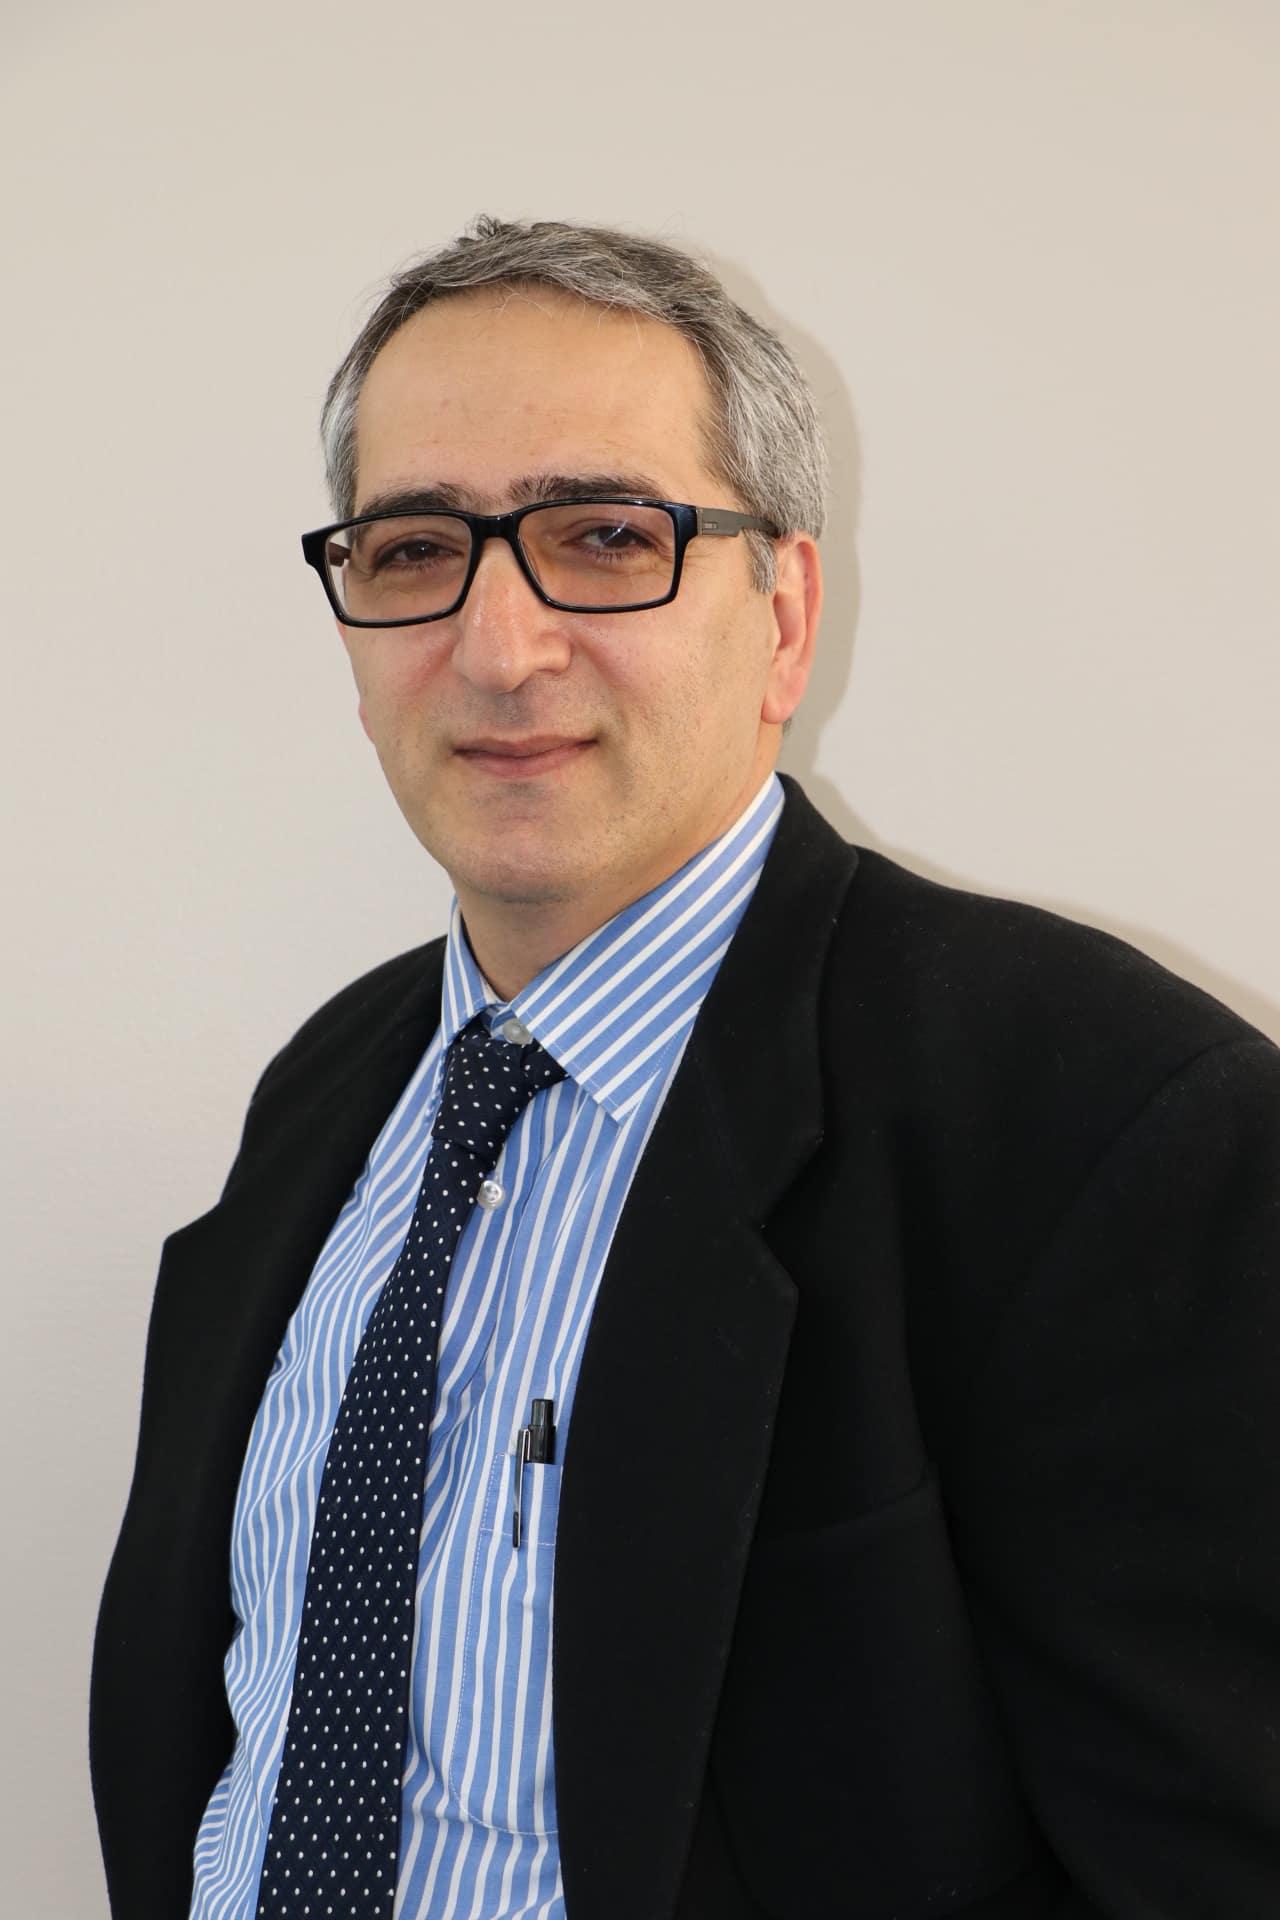 Kourosh Safaieh